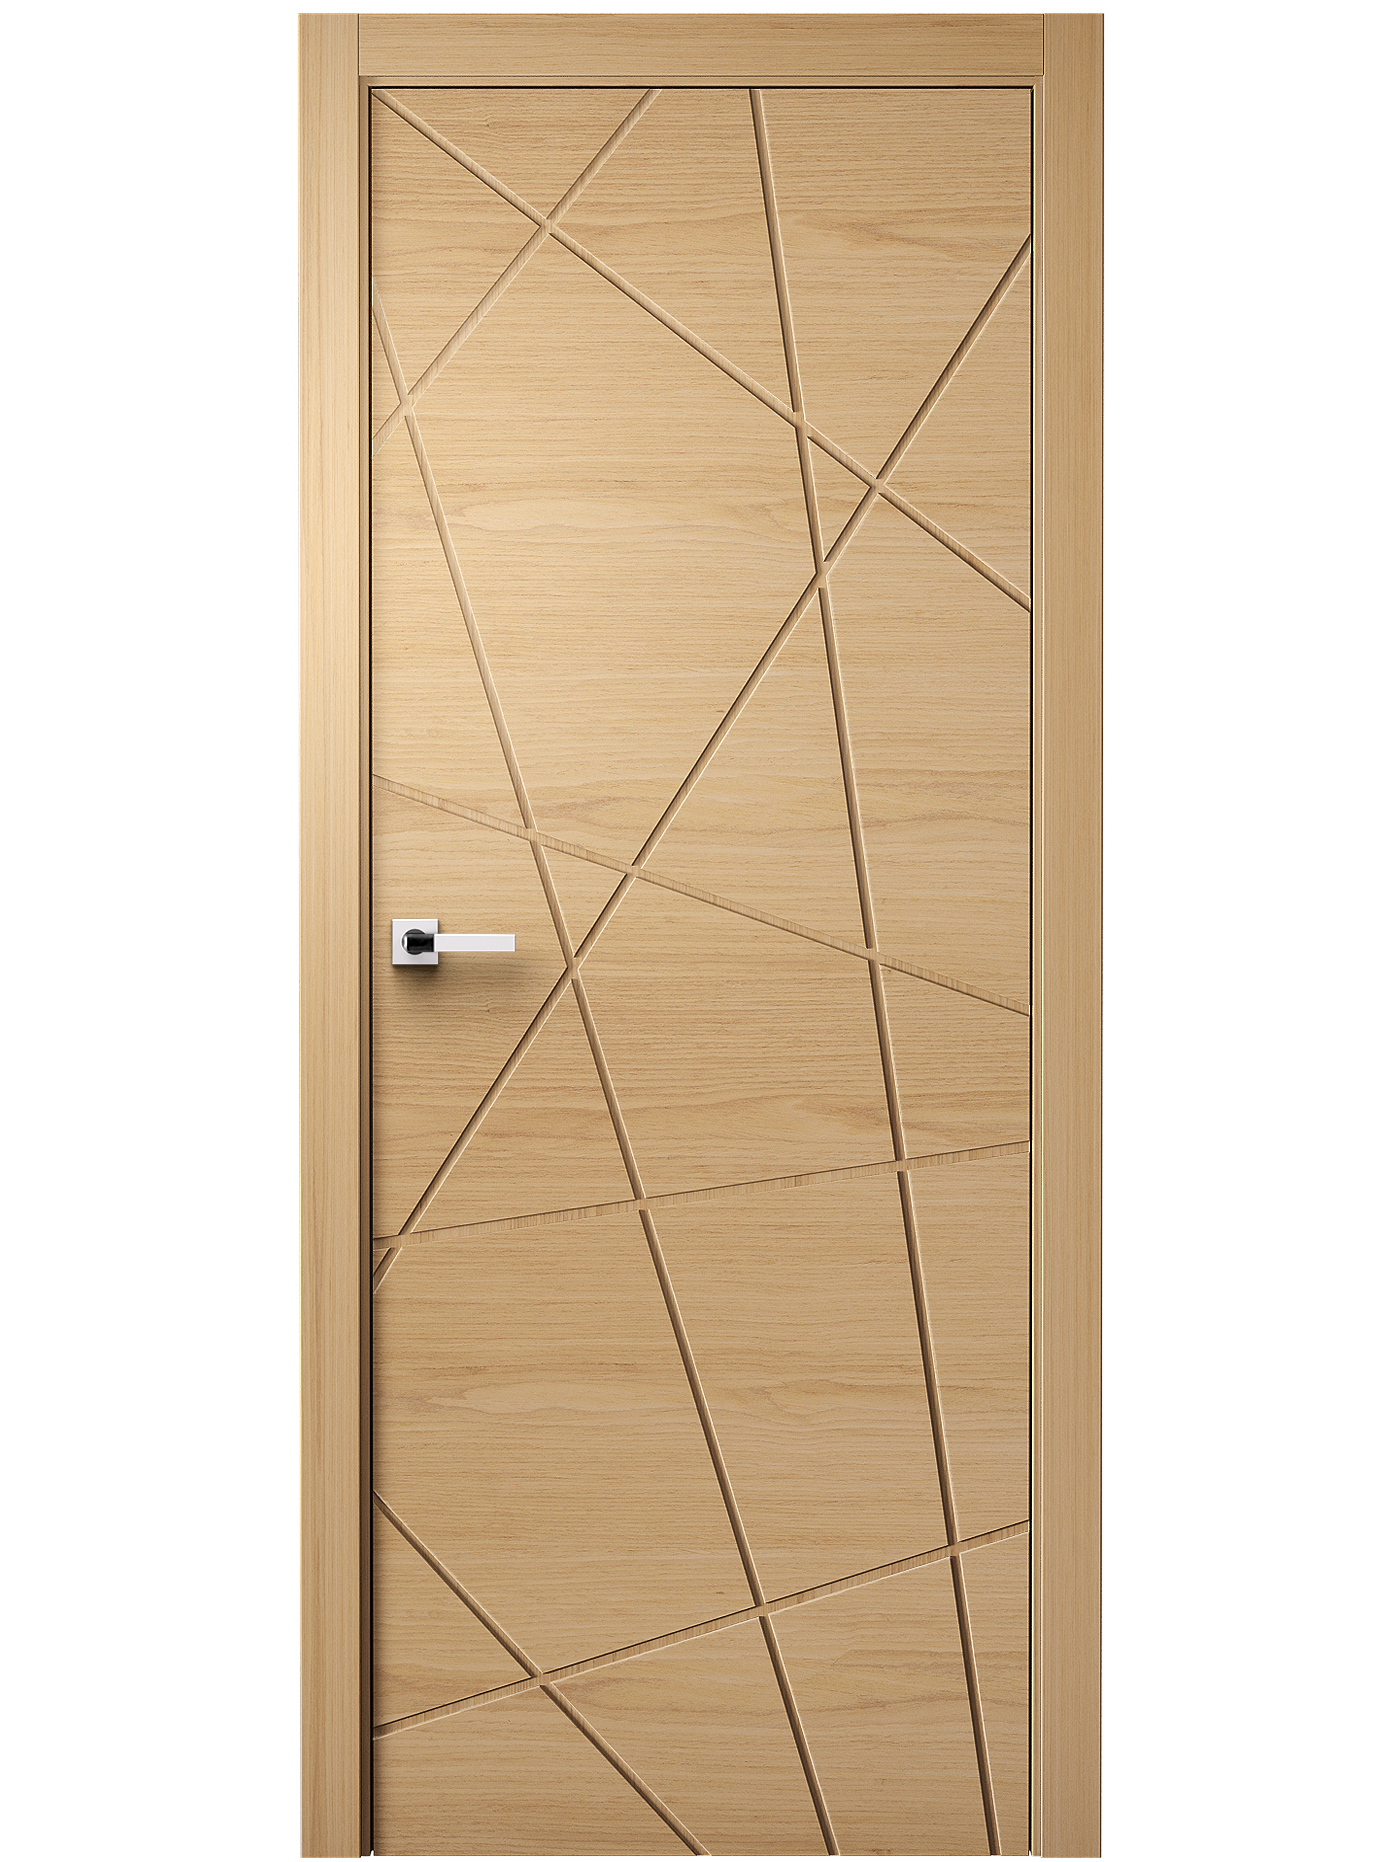 Image Juno Interior Door White Ash 1